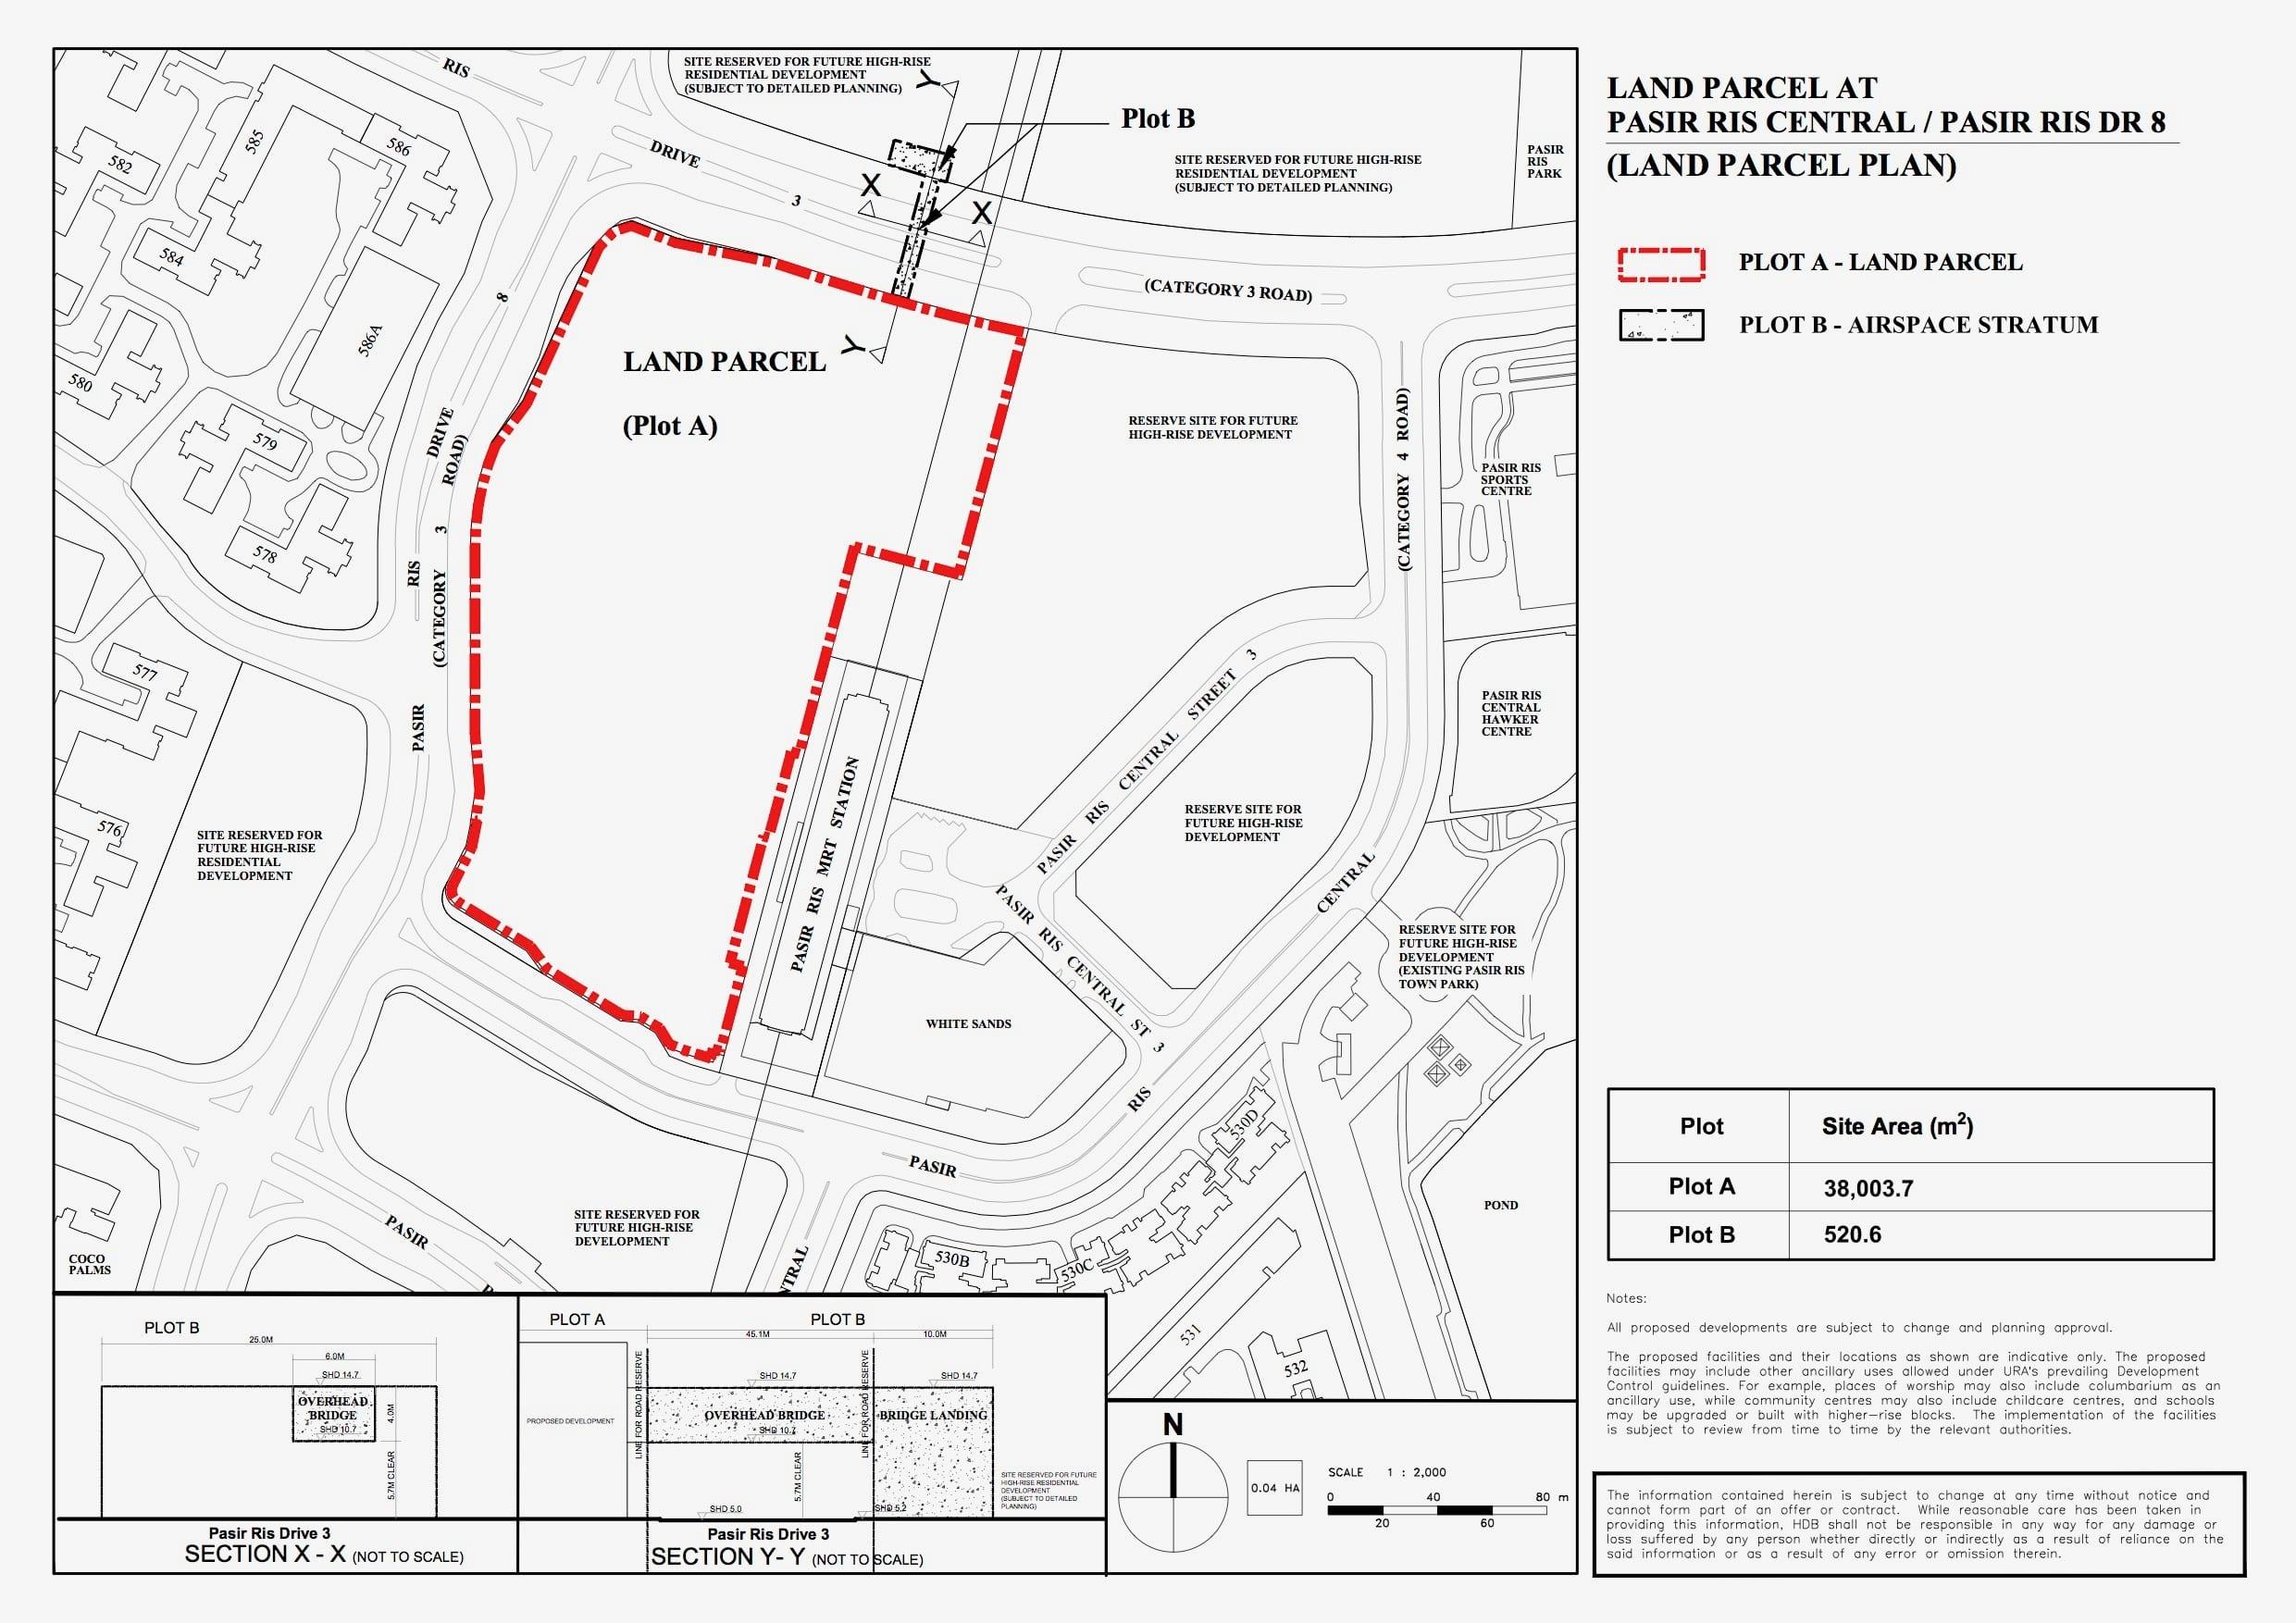 Pasir Ris Central Land Parcel Plan